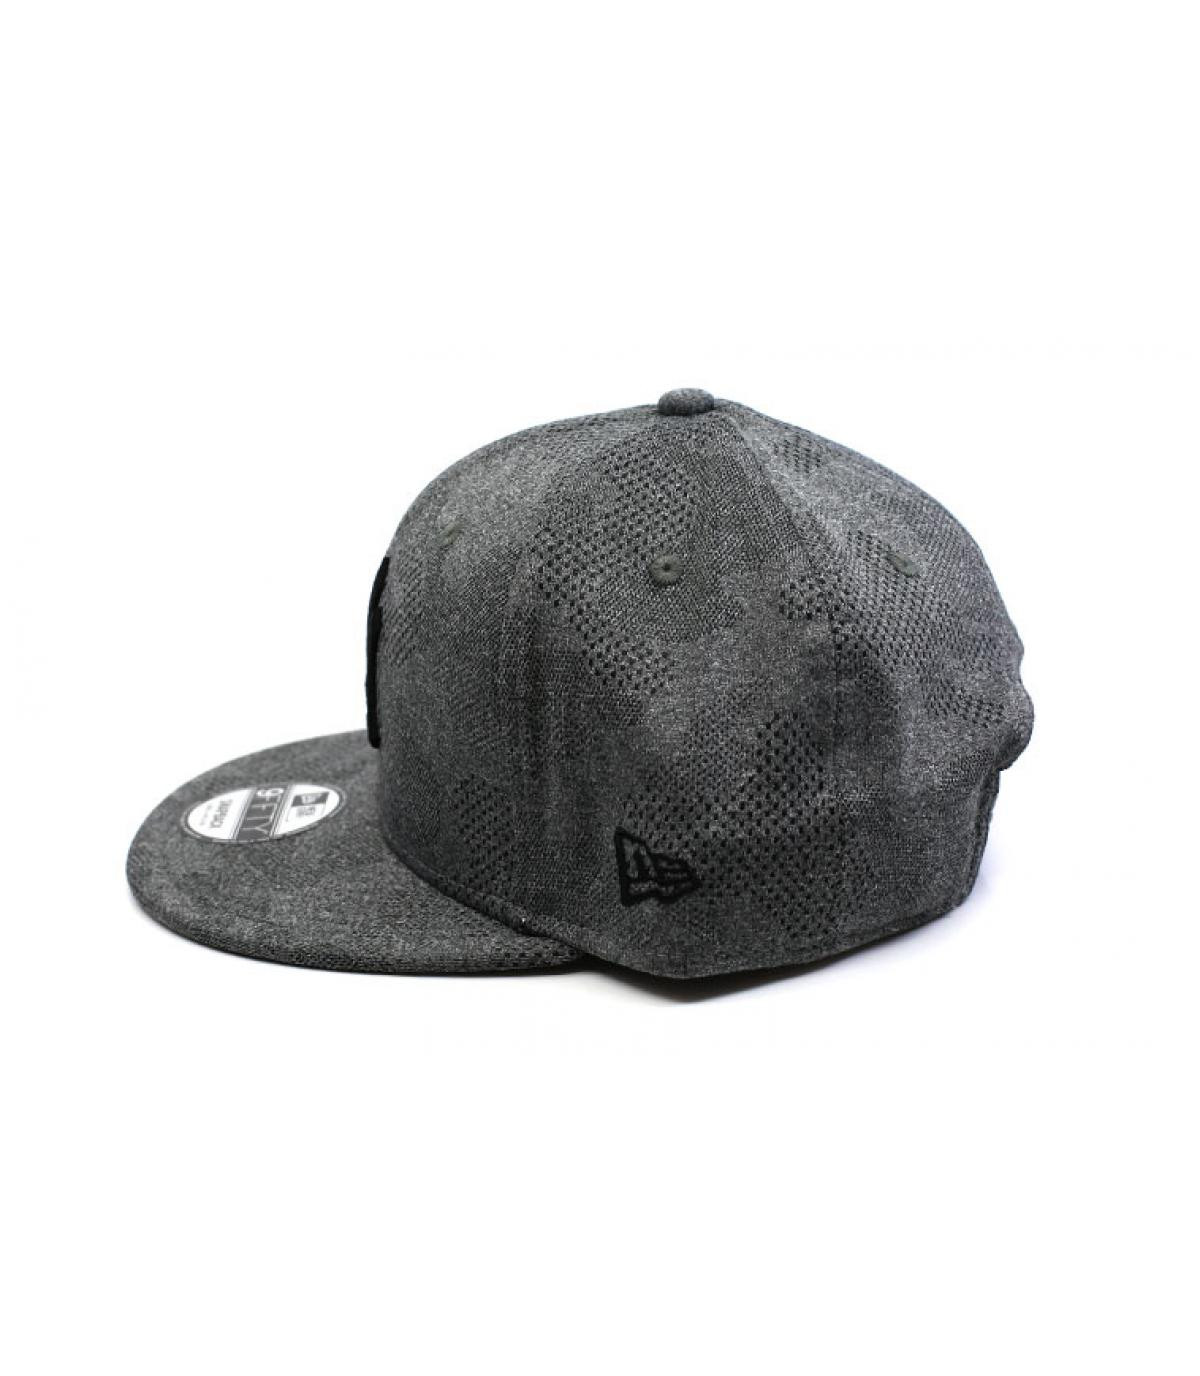 Detalles Engineered Plus NY 950 gray black imagen 4